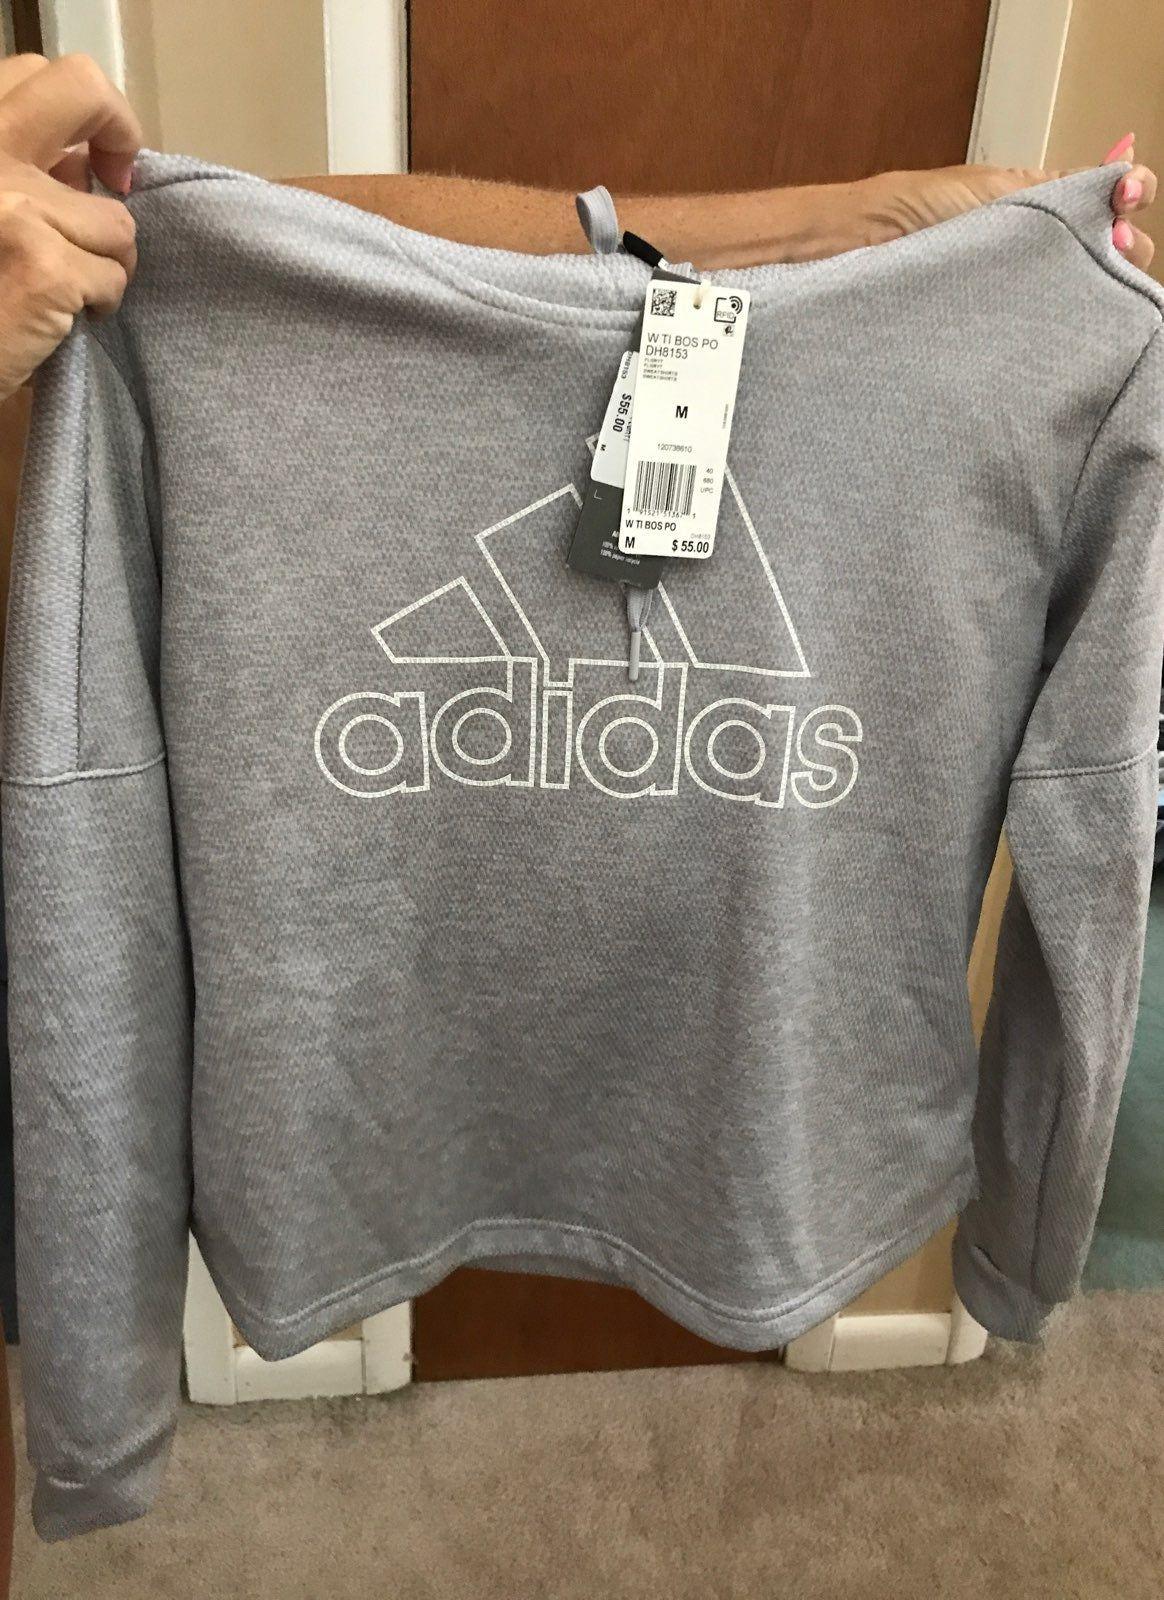 Adidas Sweatshirt Medium Brand New Sweatshirts Adidas Sweatshirt Brand New [ 1600 x 1164 Pixel ]